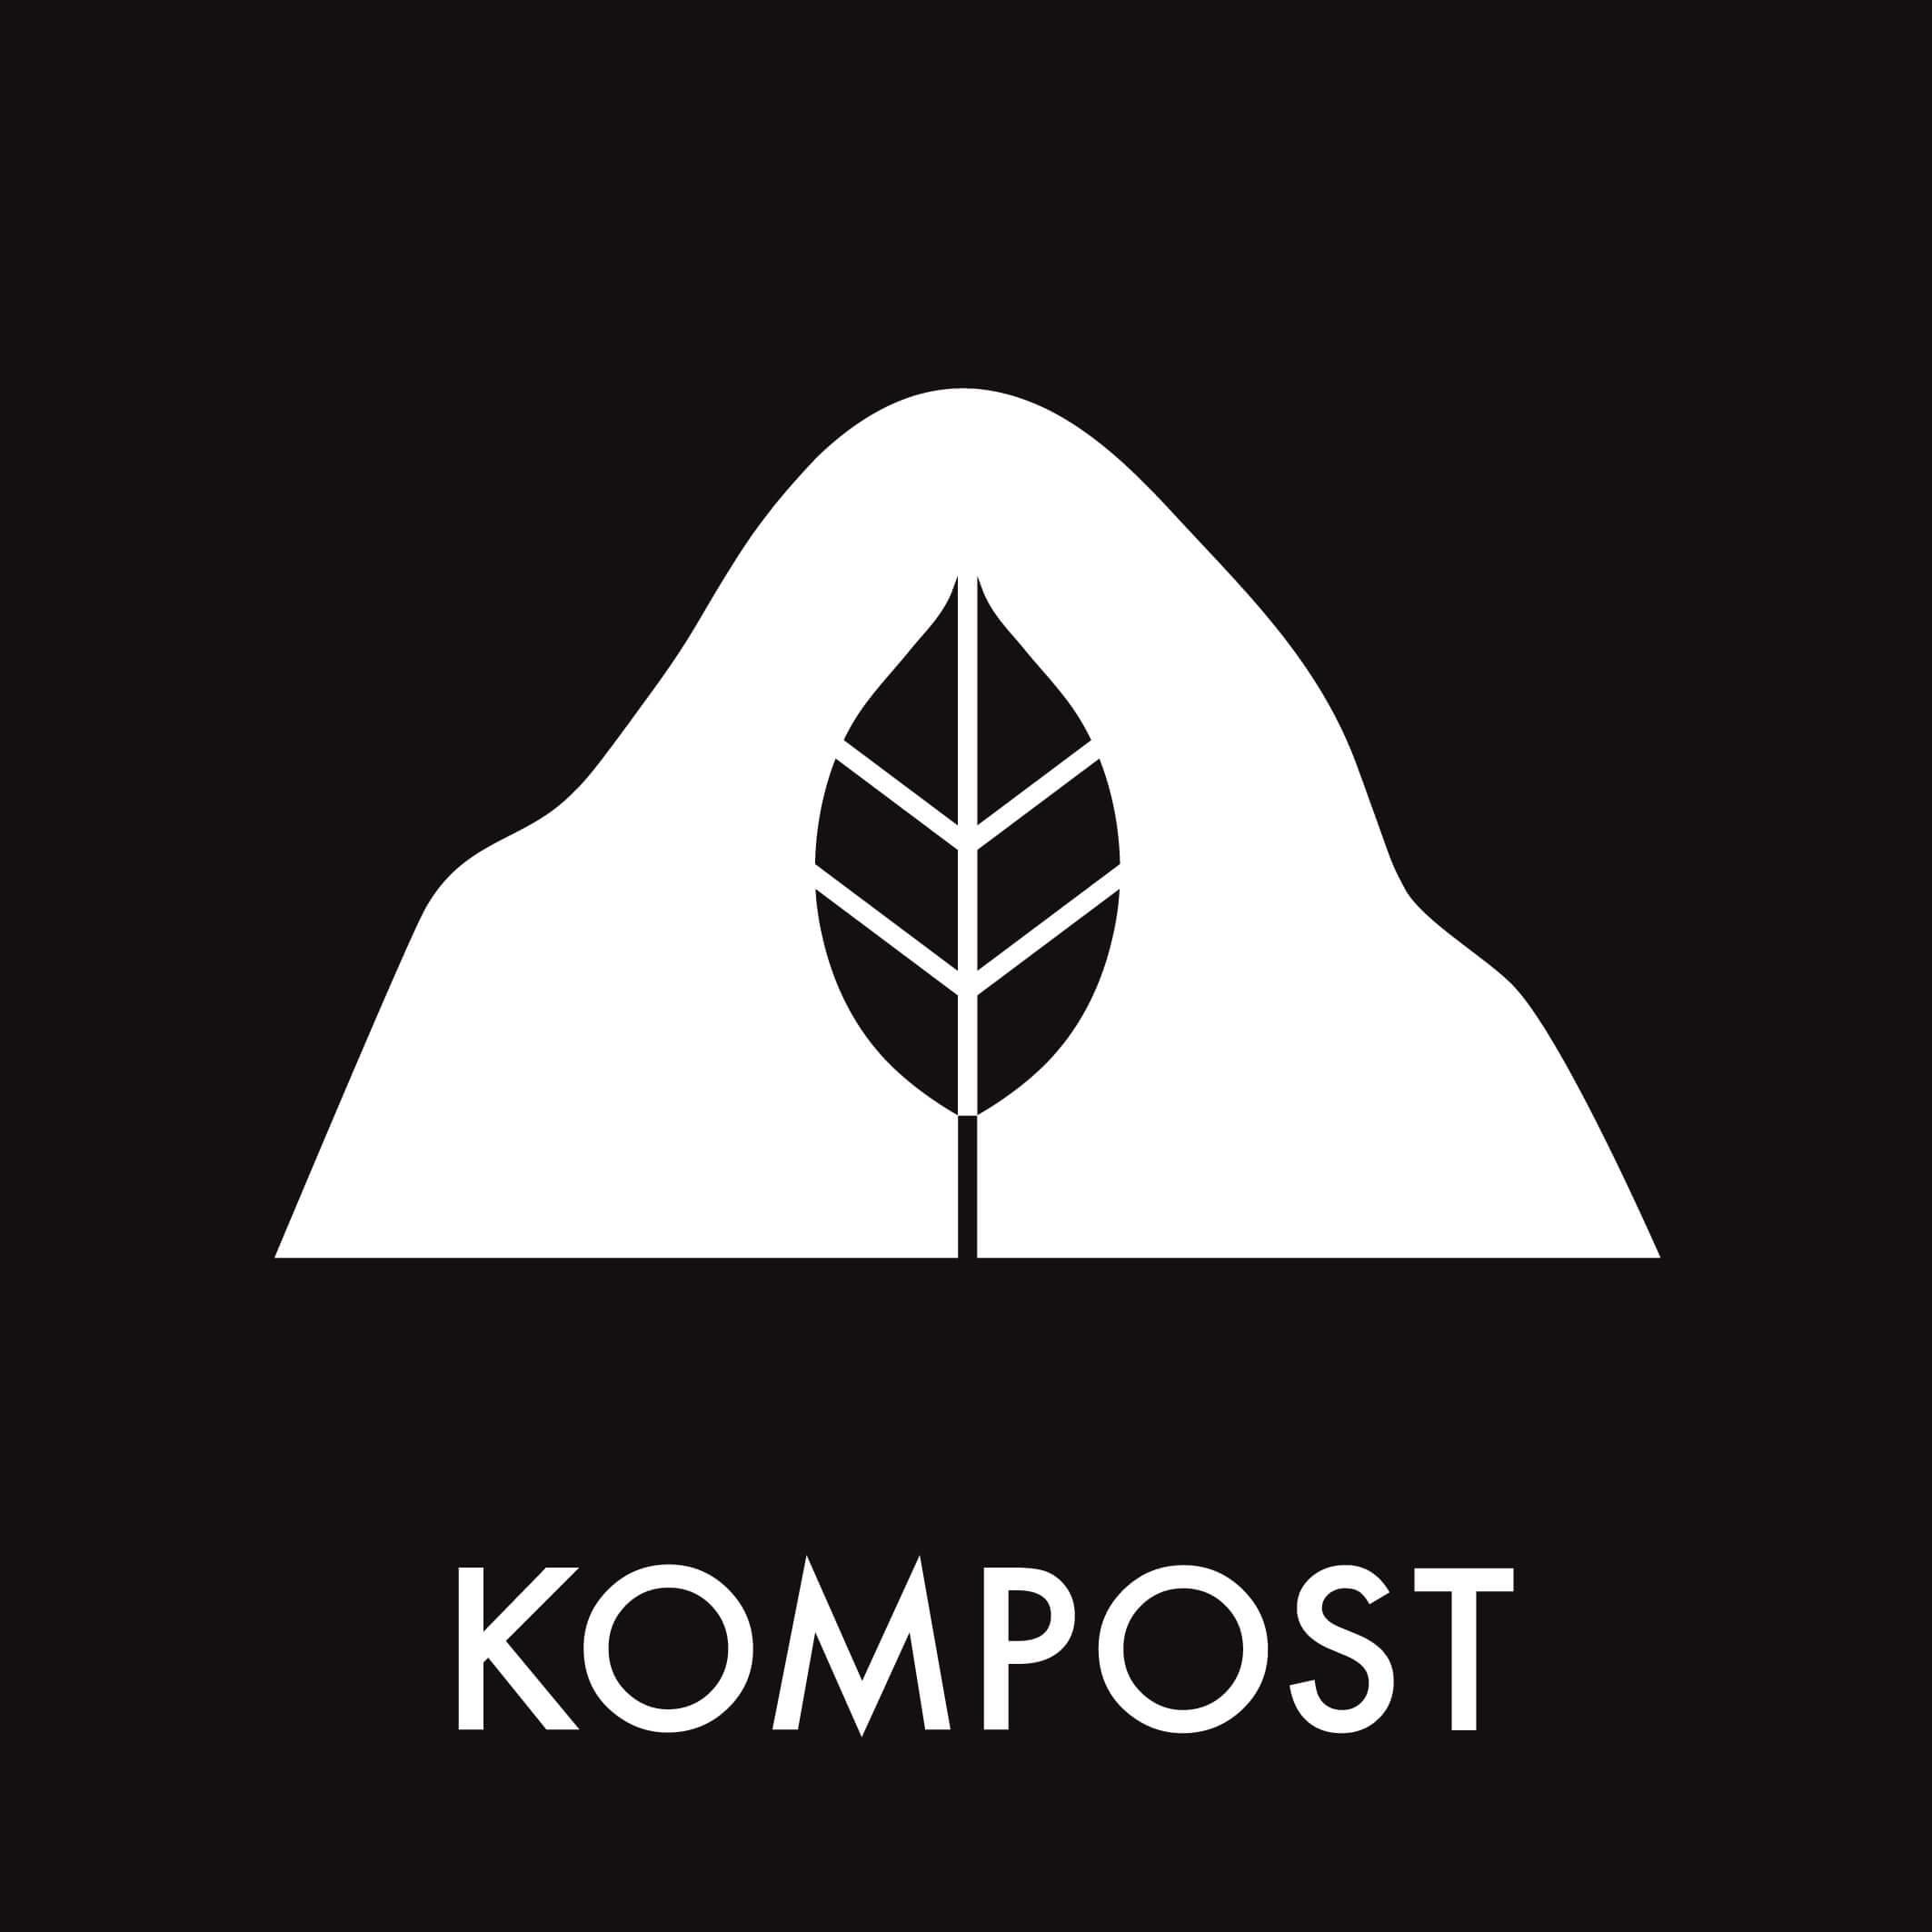 Dansk Affaldssortering - Kompost sort